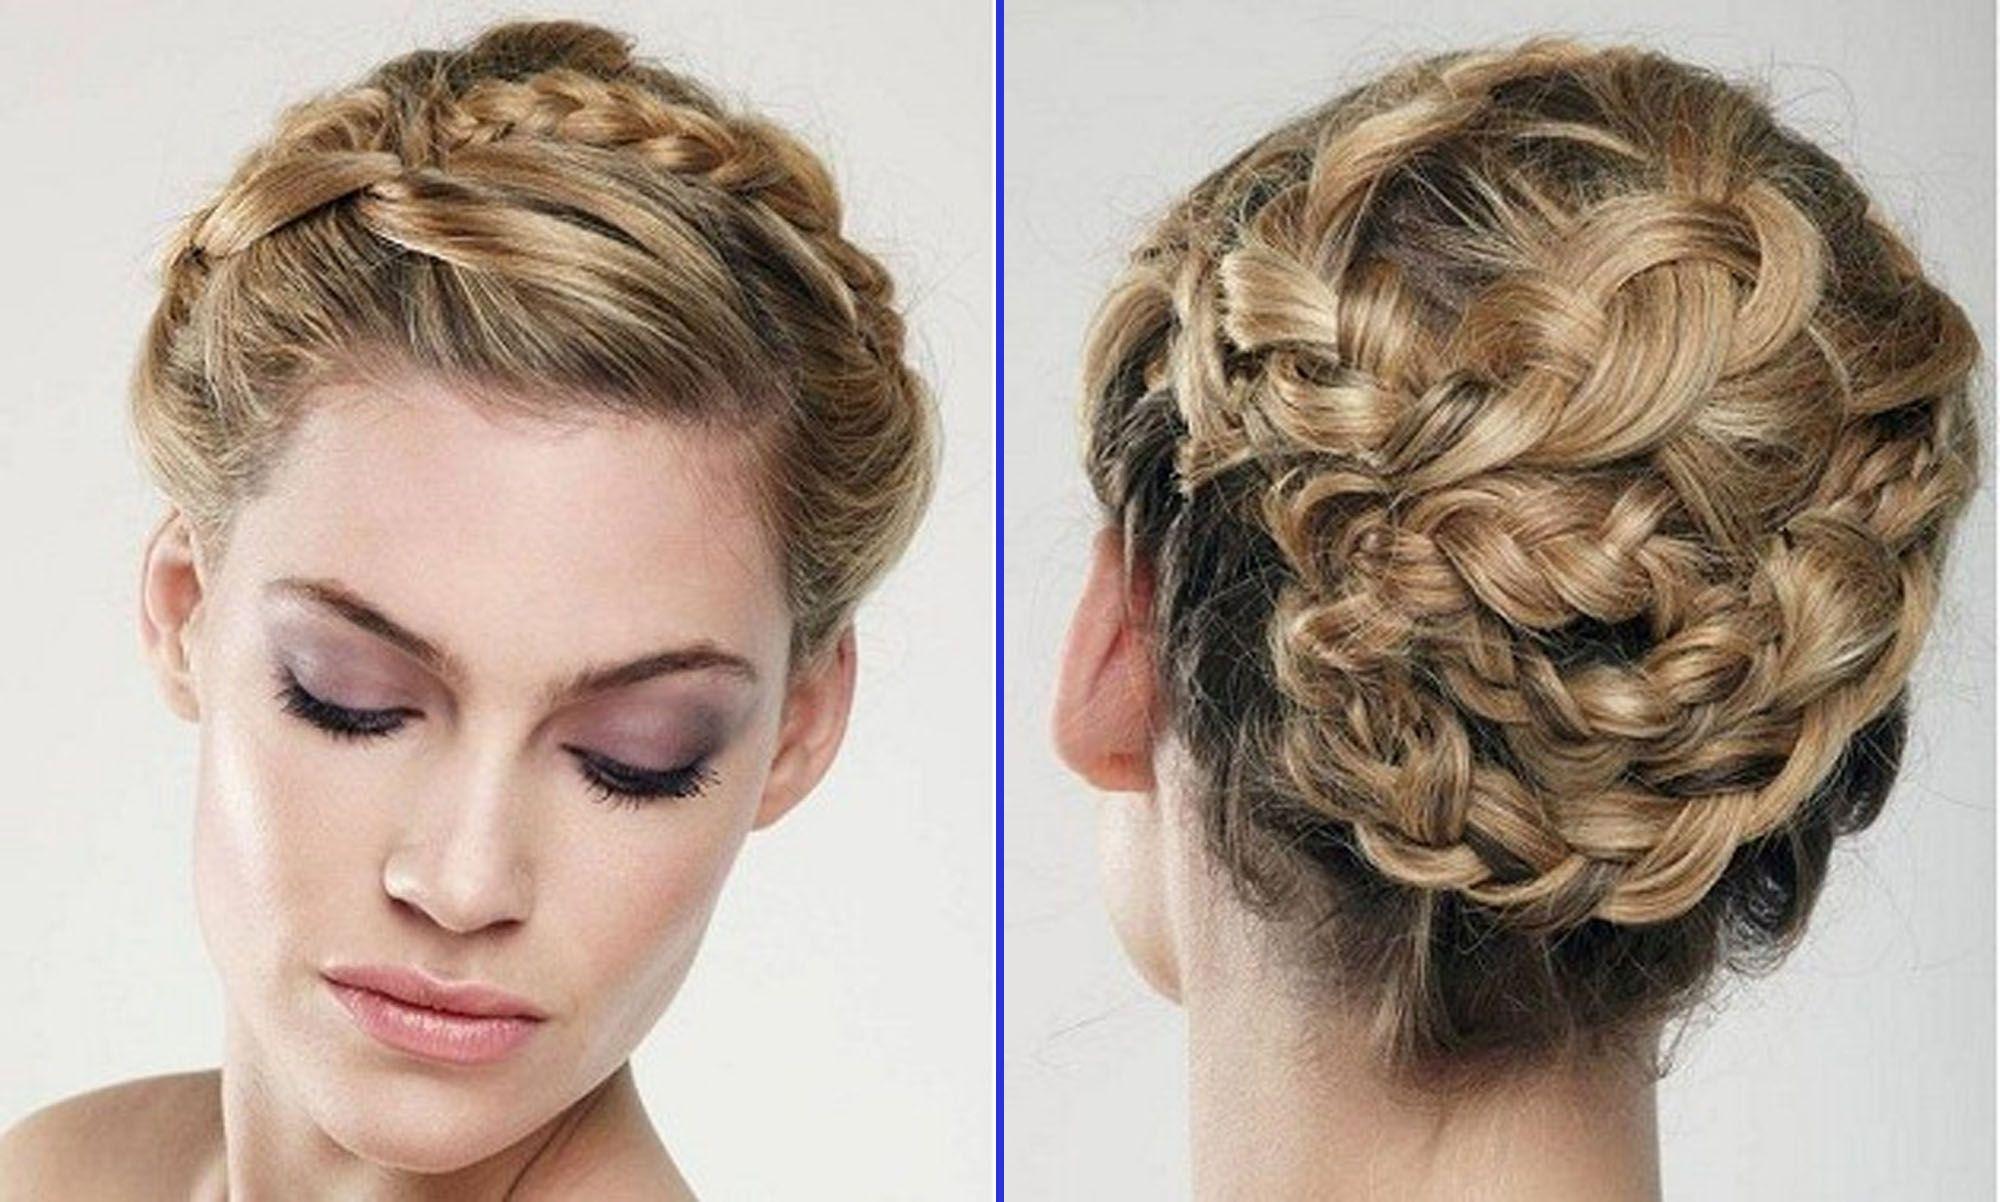 Swell Wedding Braid Hairstyle Wedding Planning Hair Pinterest Short Hairstyles Gunalazisus